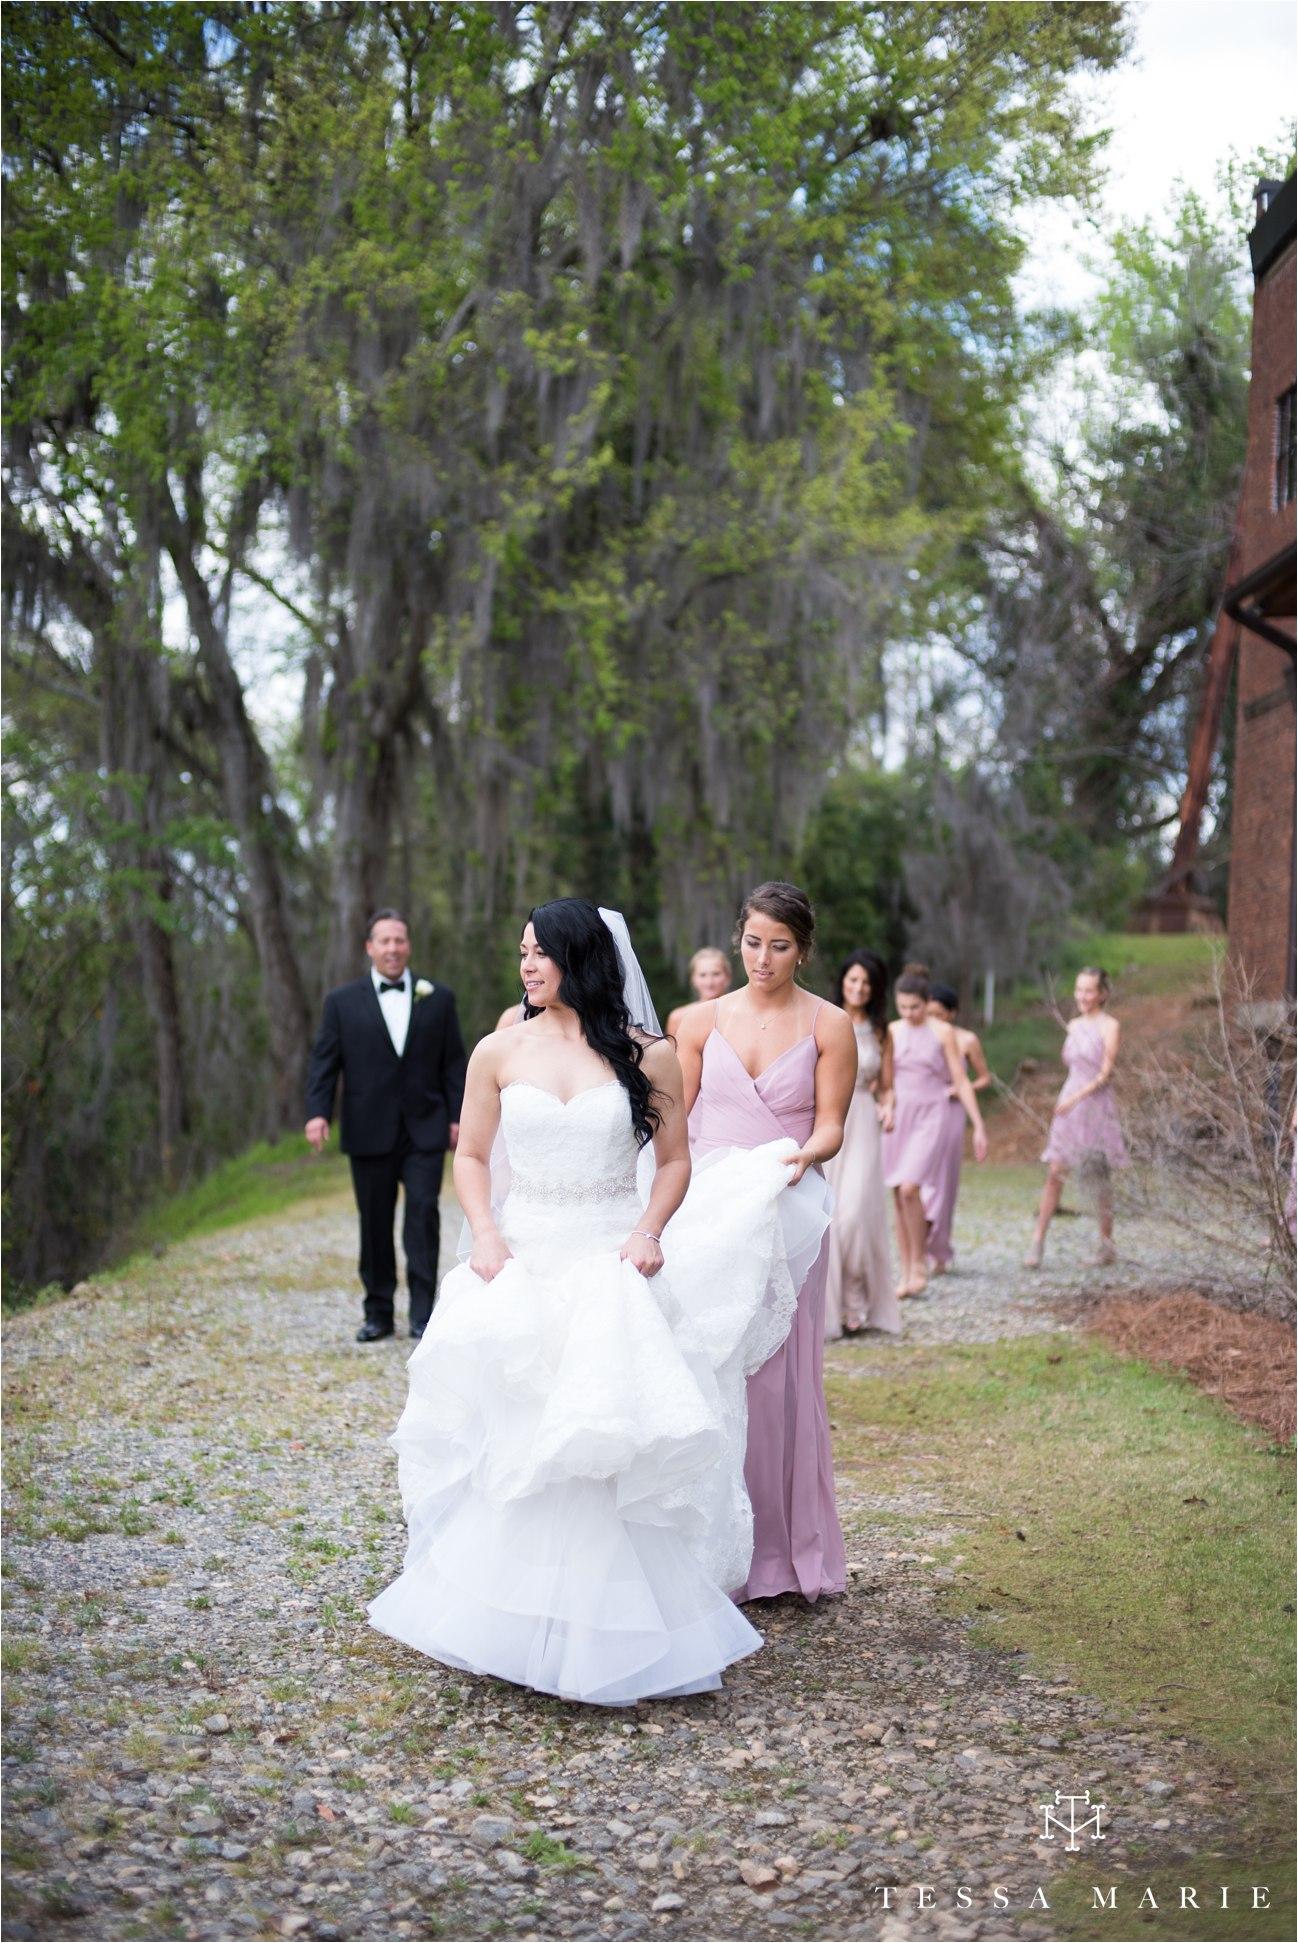 tessa_marie_weddings_rivermill_event_centere_candid_outdoor_wedding_photos_0056